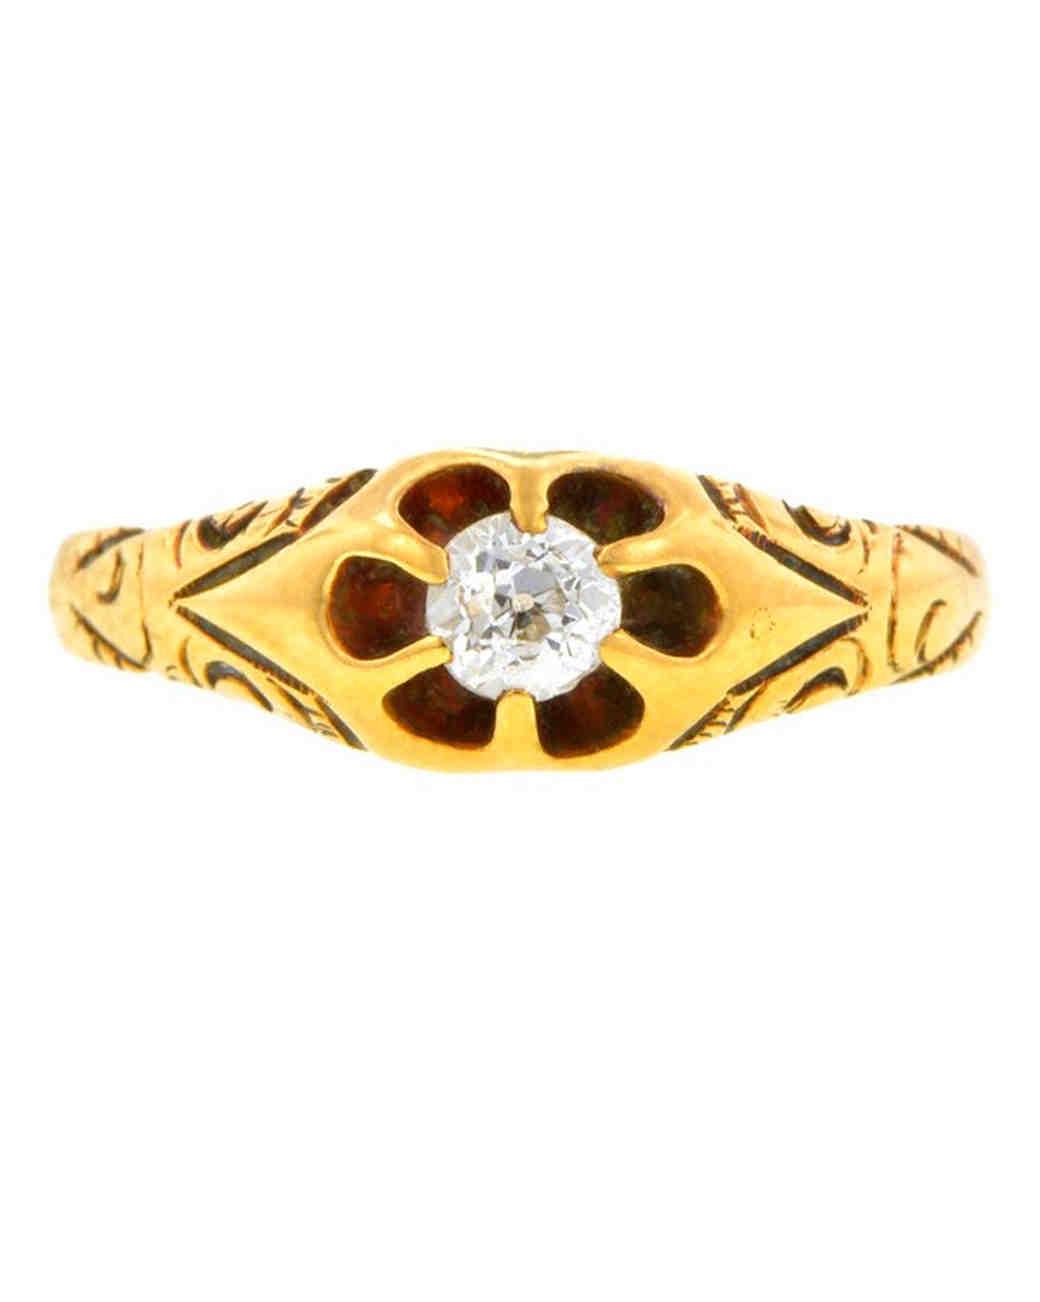 buying-vintage-engagement-ring-doyle-doyle-victorian-engraved-band-0215.jpg